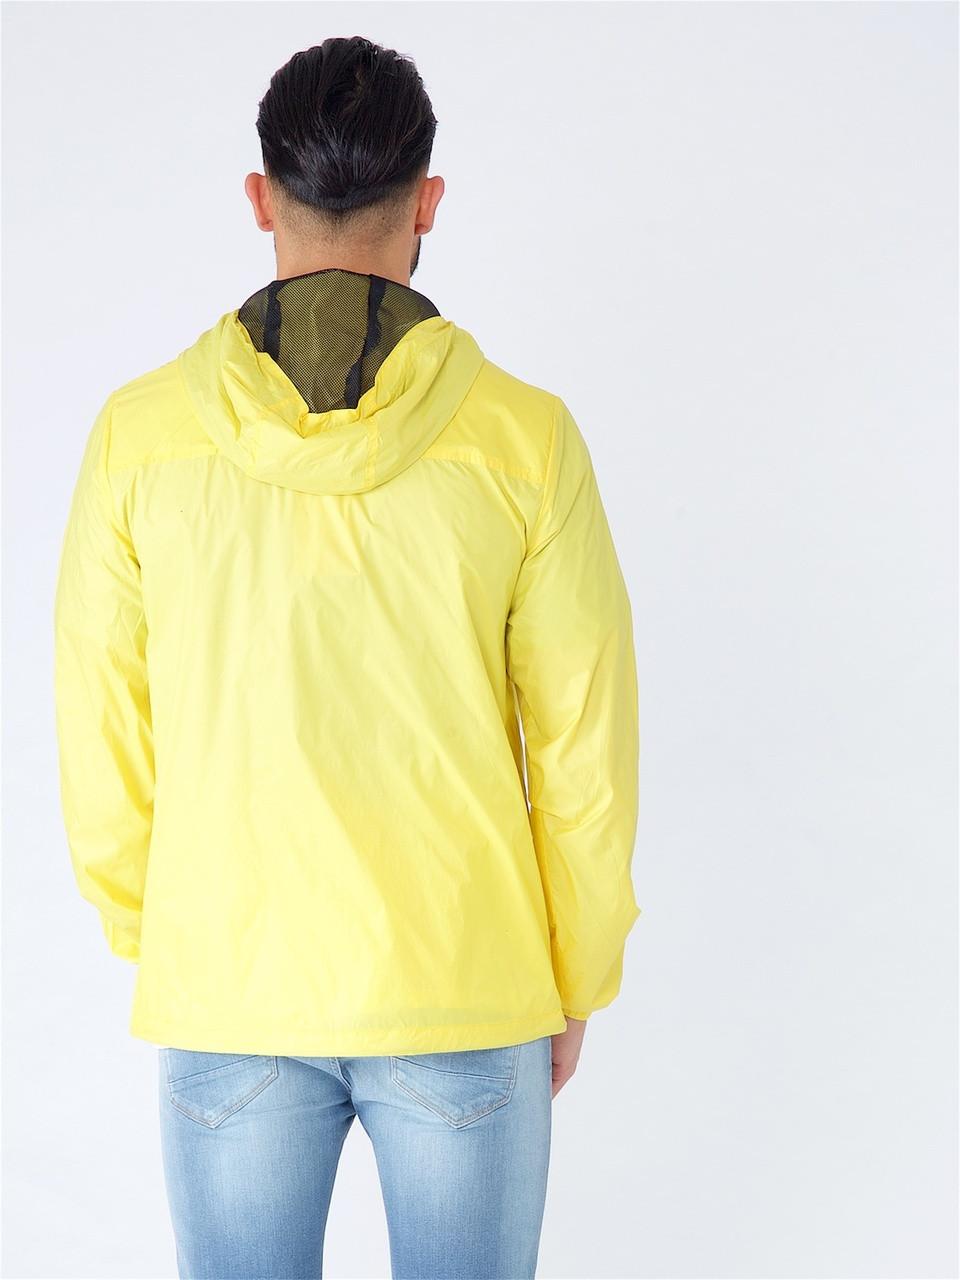 Yellow Light Weight Hooded Windbreaker